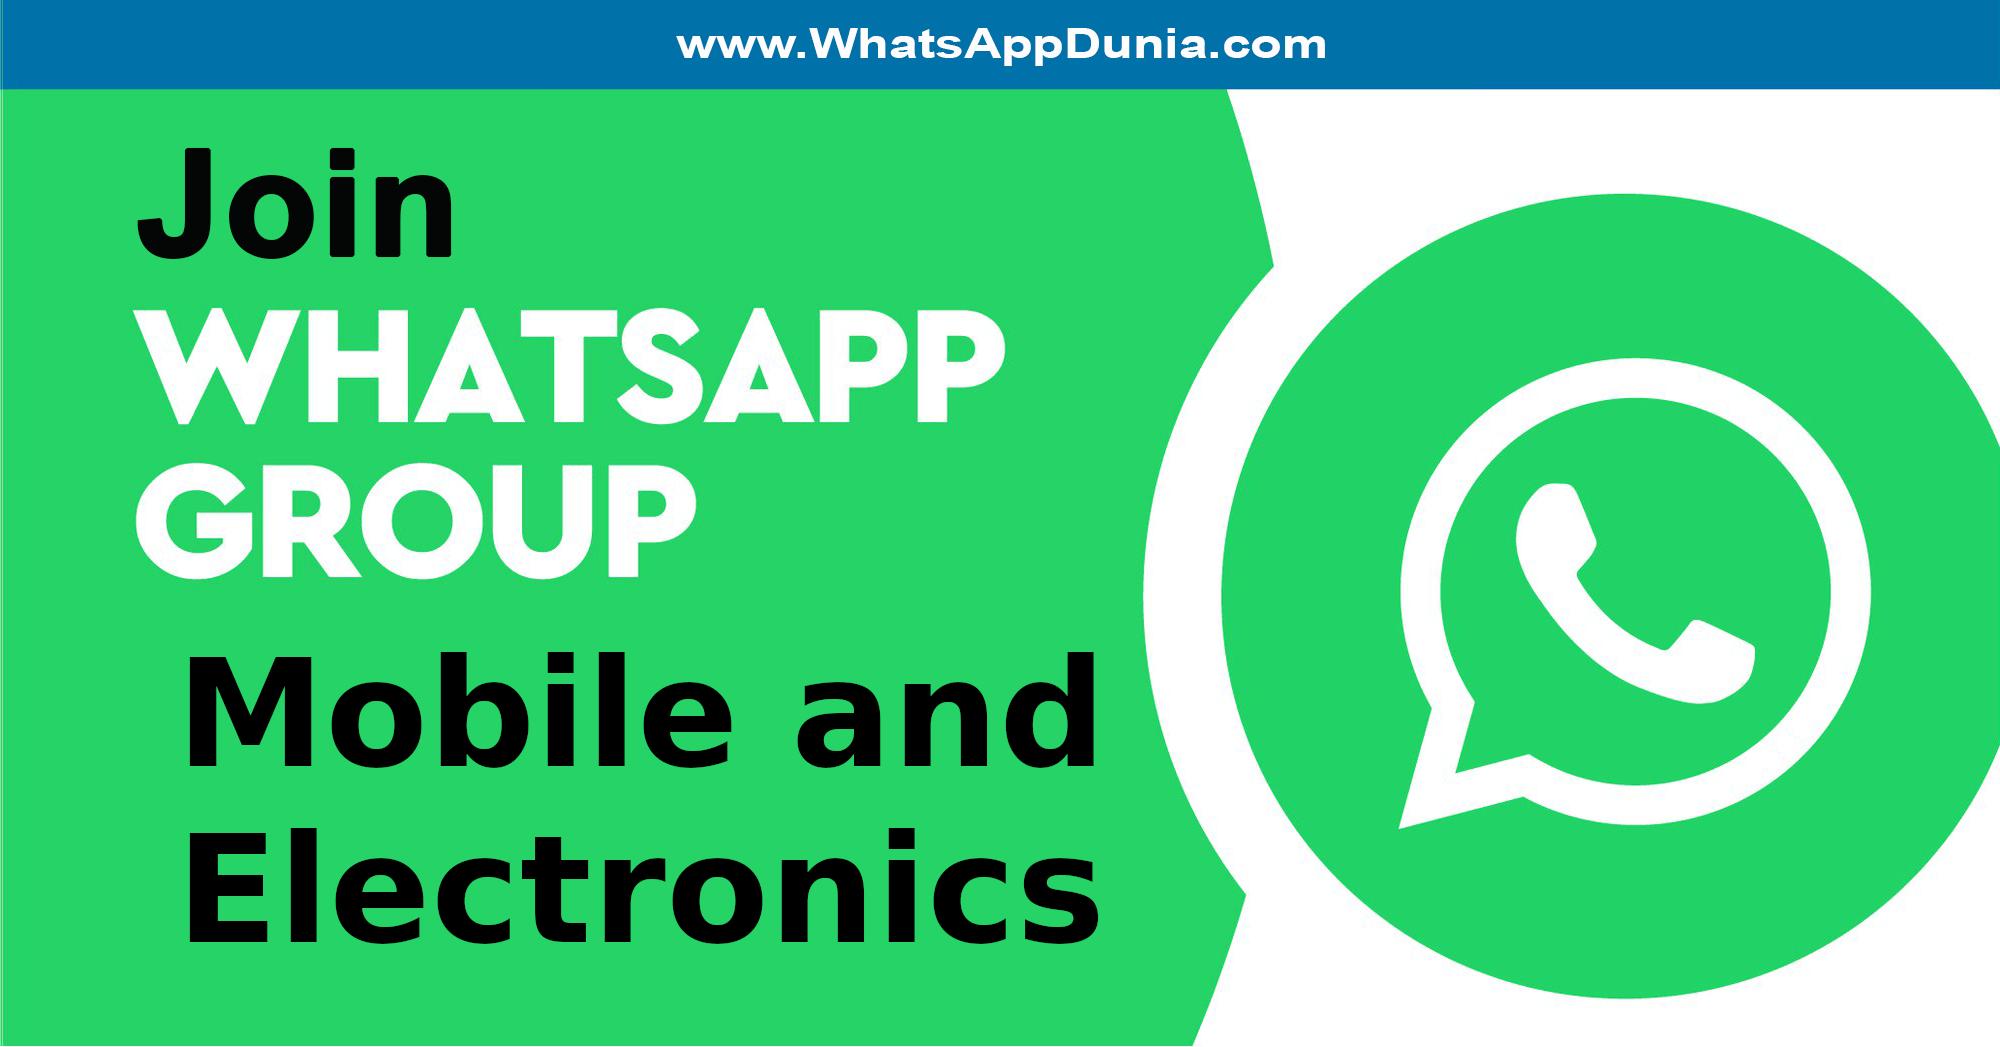 Mobile and Electronics WhatsApp Group Links